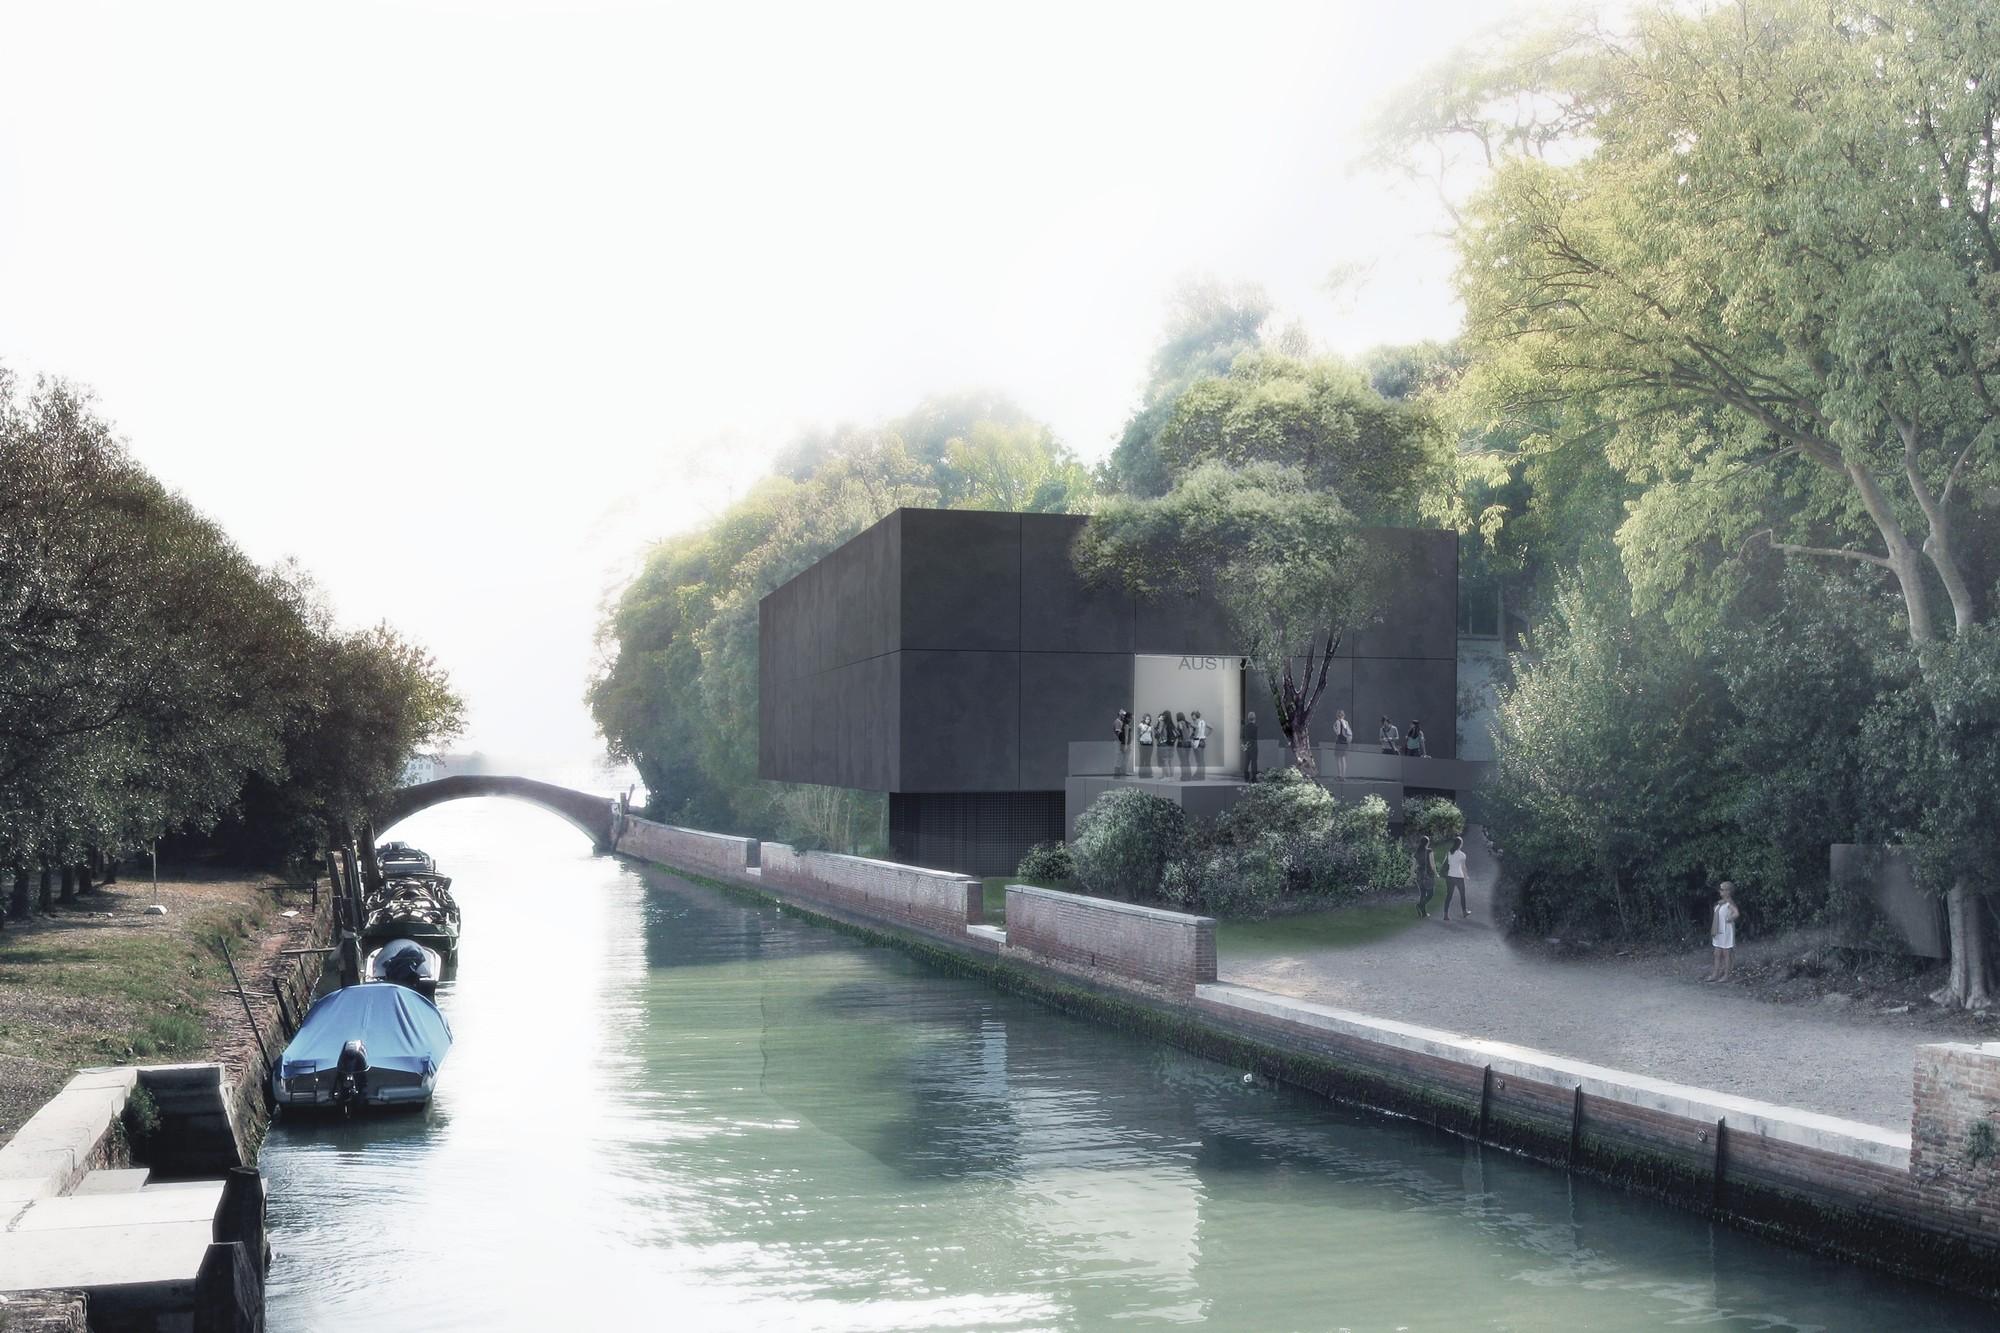 Denton Corker Marshall's Australian Pavilion to Debut at the 56th Venice Biennale, © Denton Corker Marshall